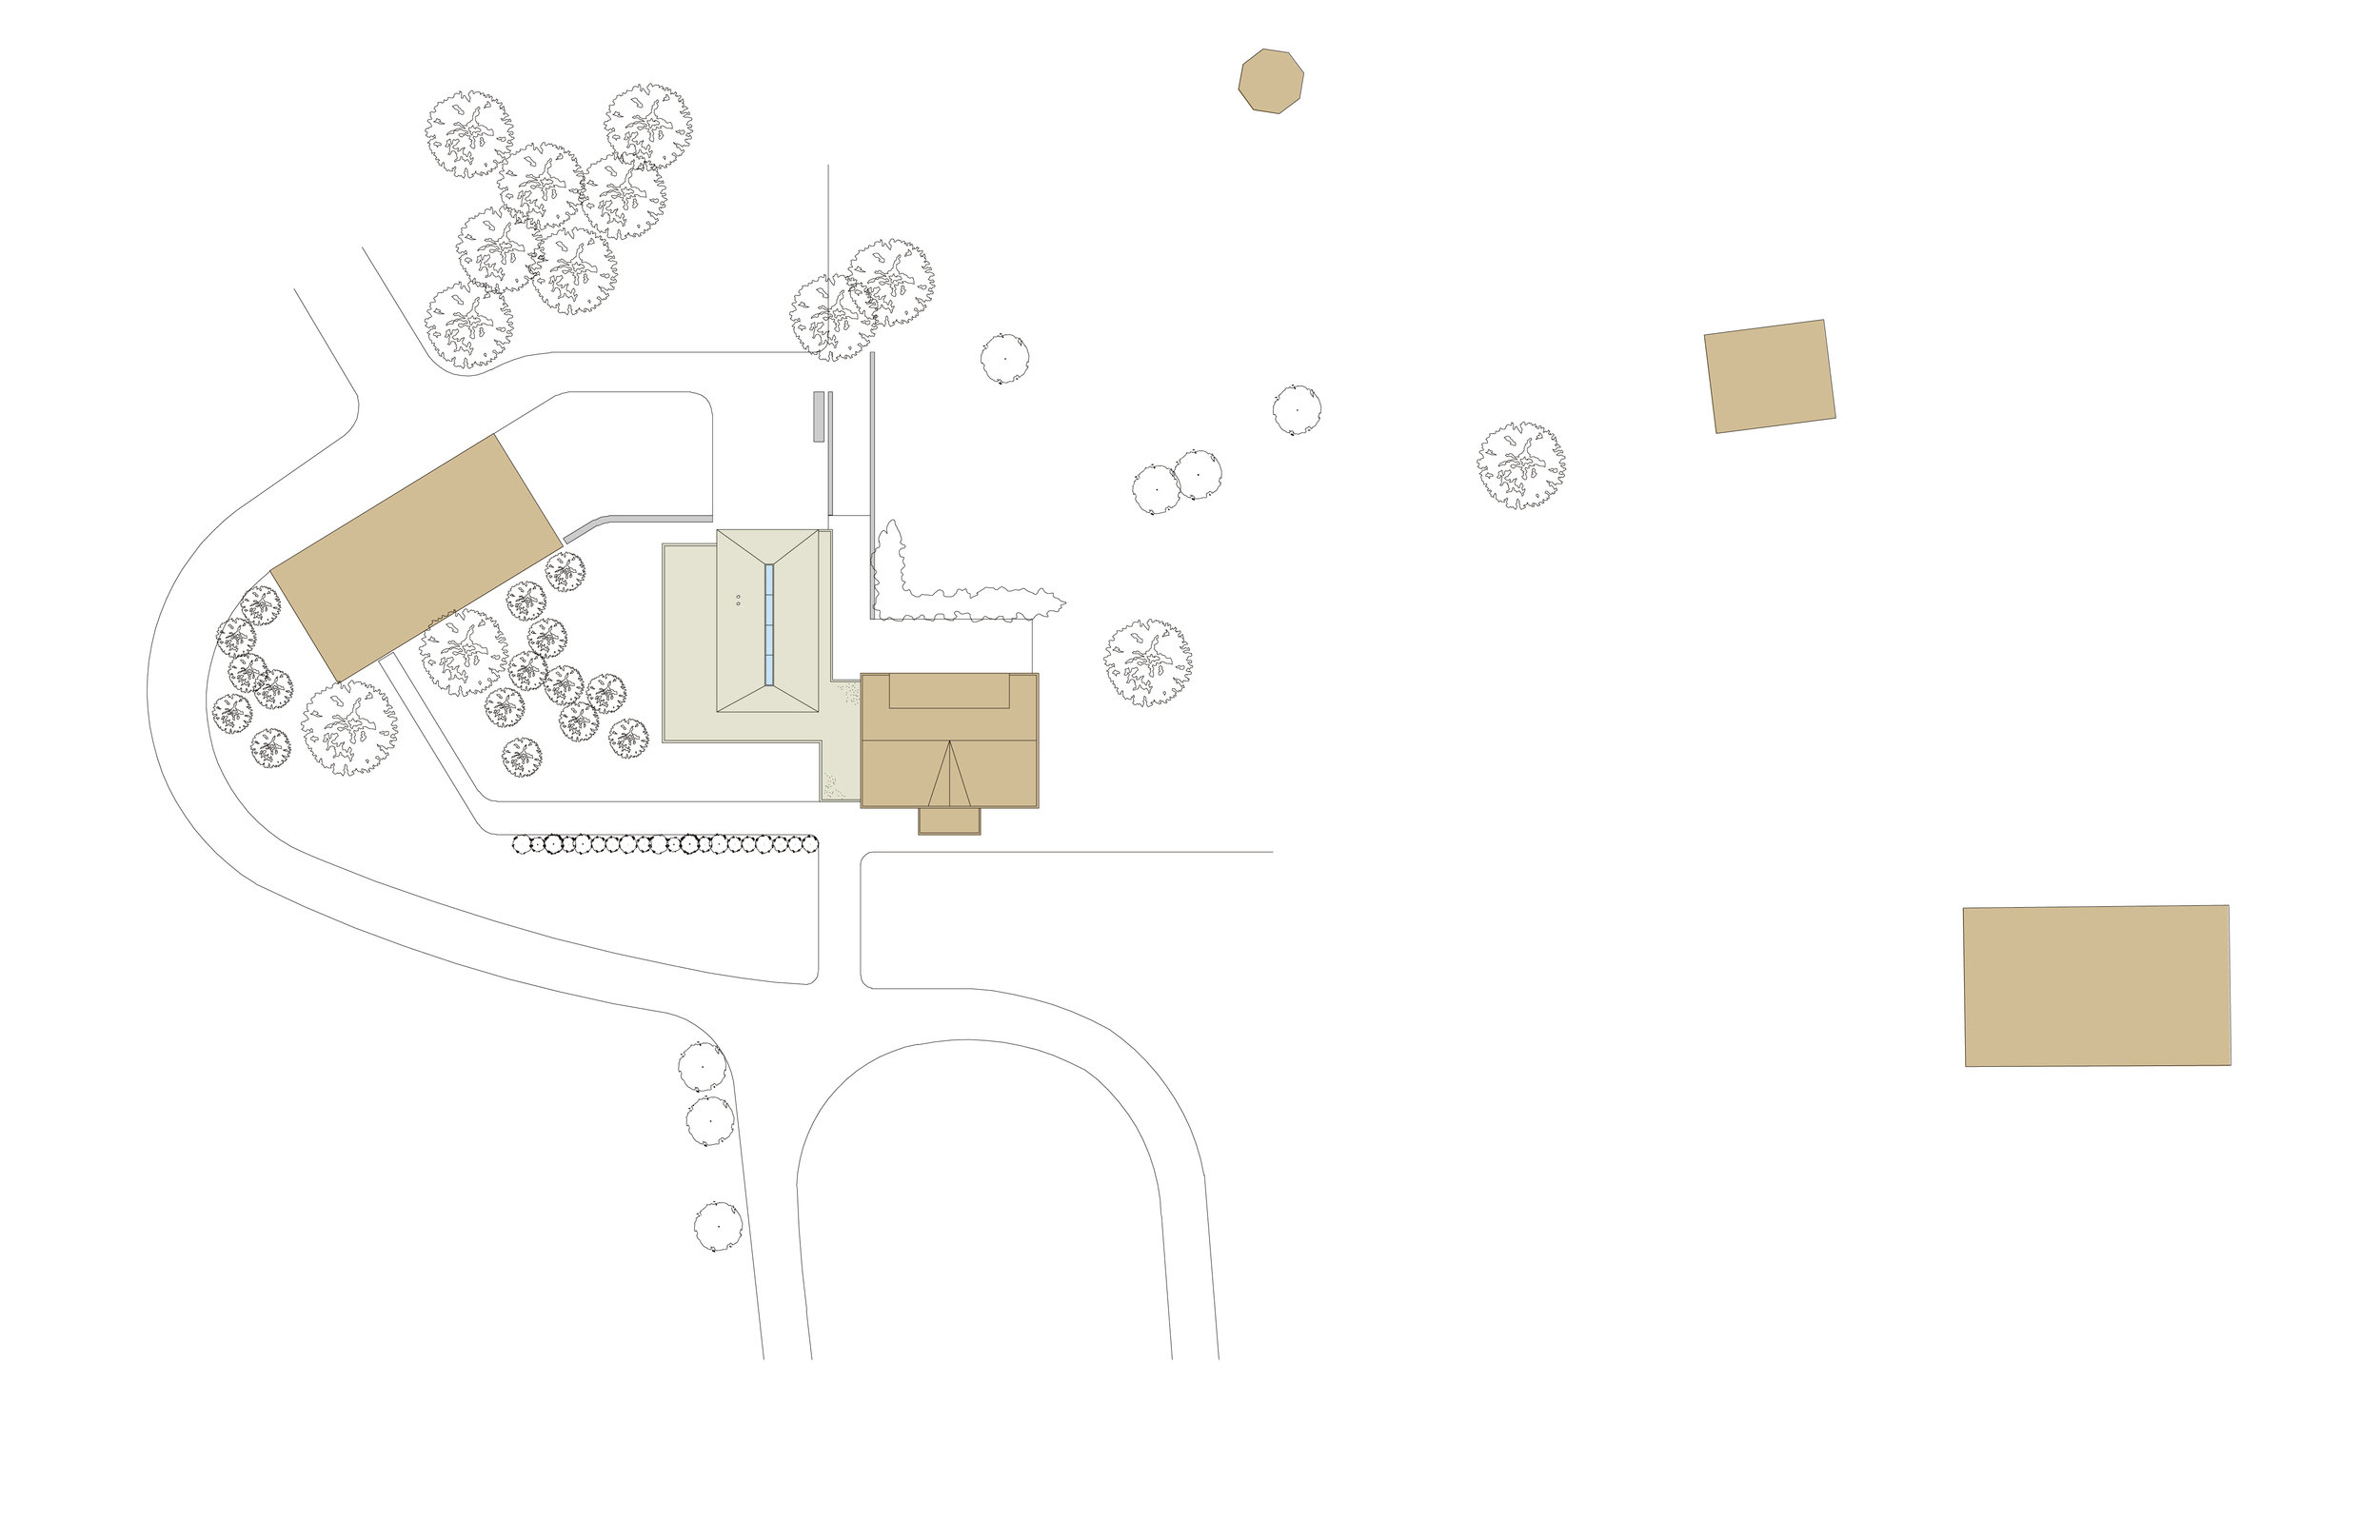 Plan-Site 1-32 [Converted]-01.jpg